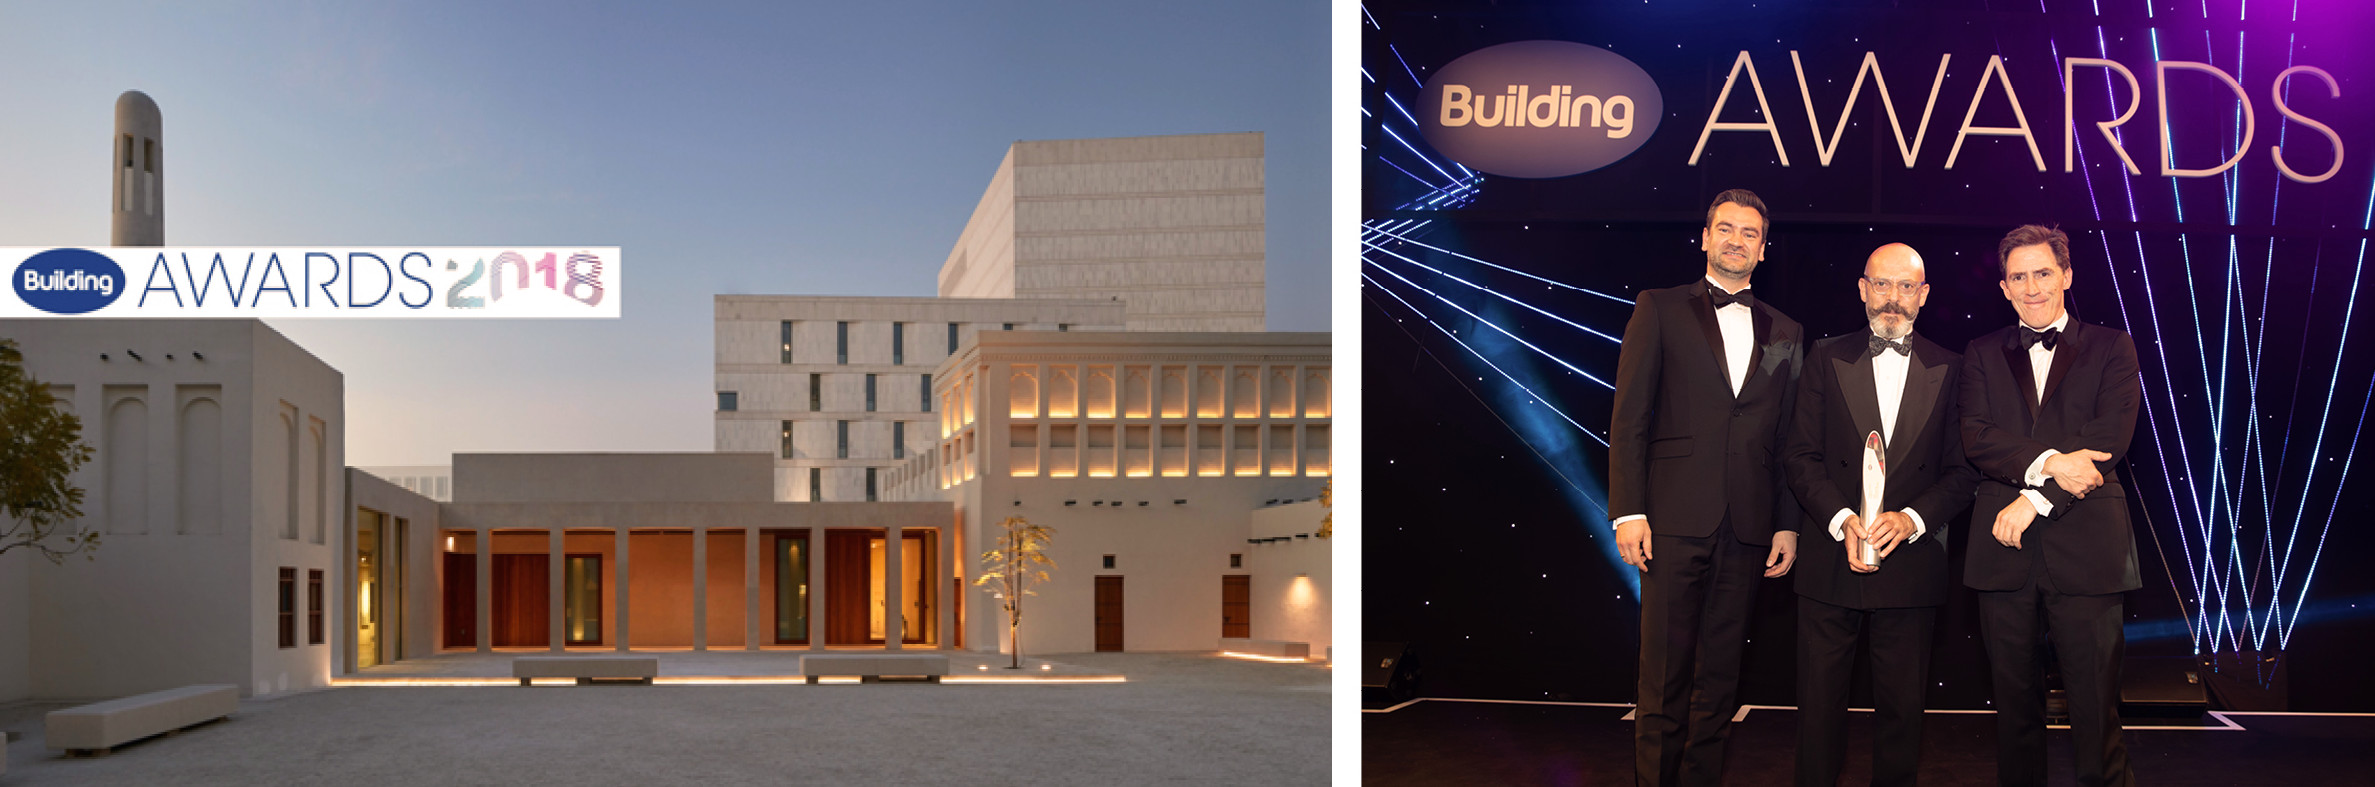 Building Awards strip_ps.jpg